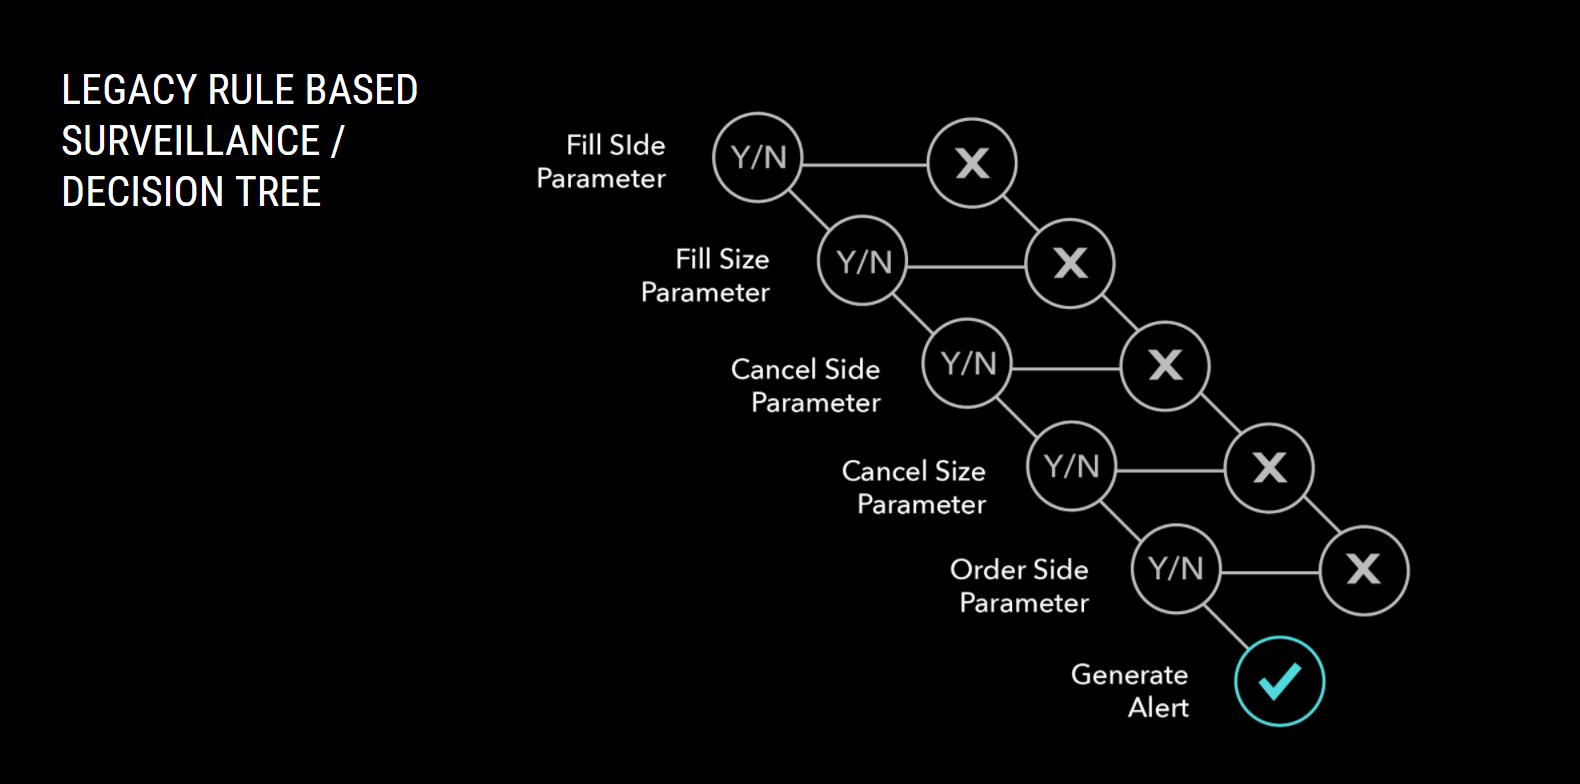 rule based trade surveillance decision tree